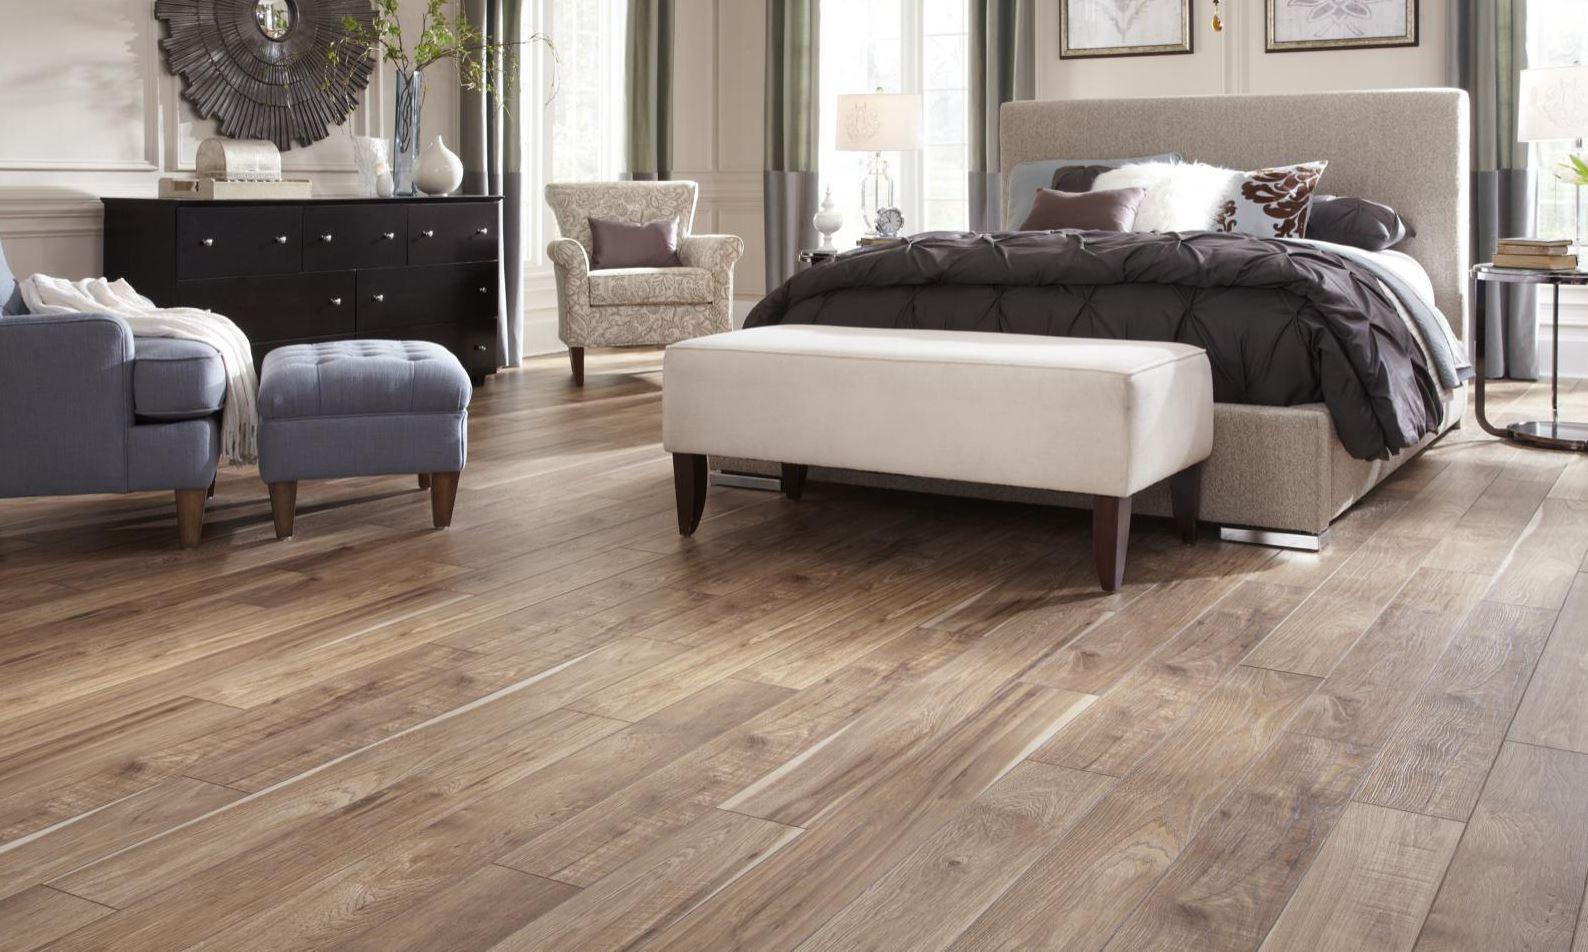 maple walnut hardwood flooring of luxury vinyl plank flooring that looks like wood with regard to mannington adura luxury vinyl plank flooring 57aa7d065f9b58974a2be49e jpg